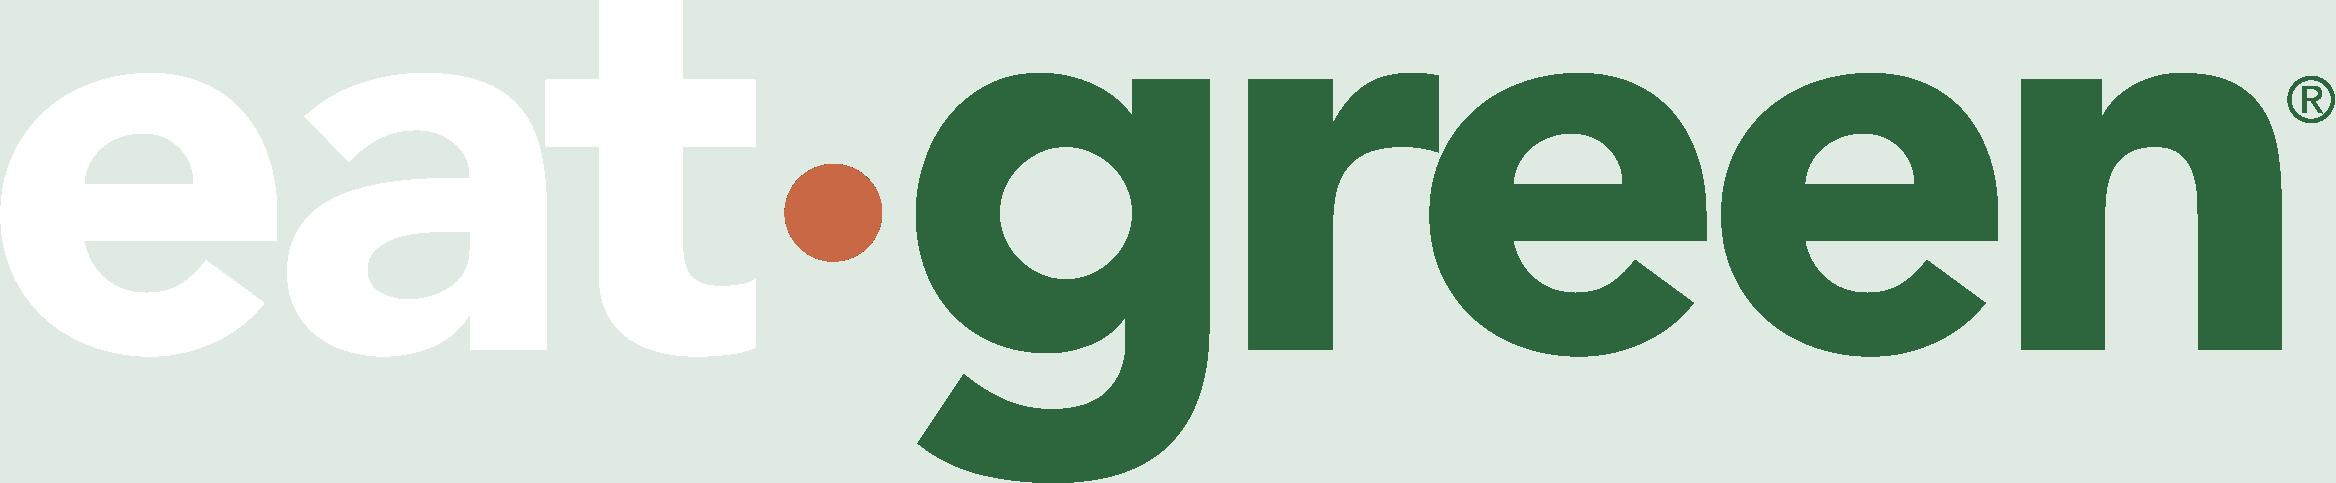 EatGreen Logo